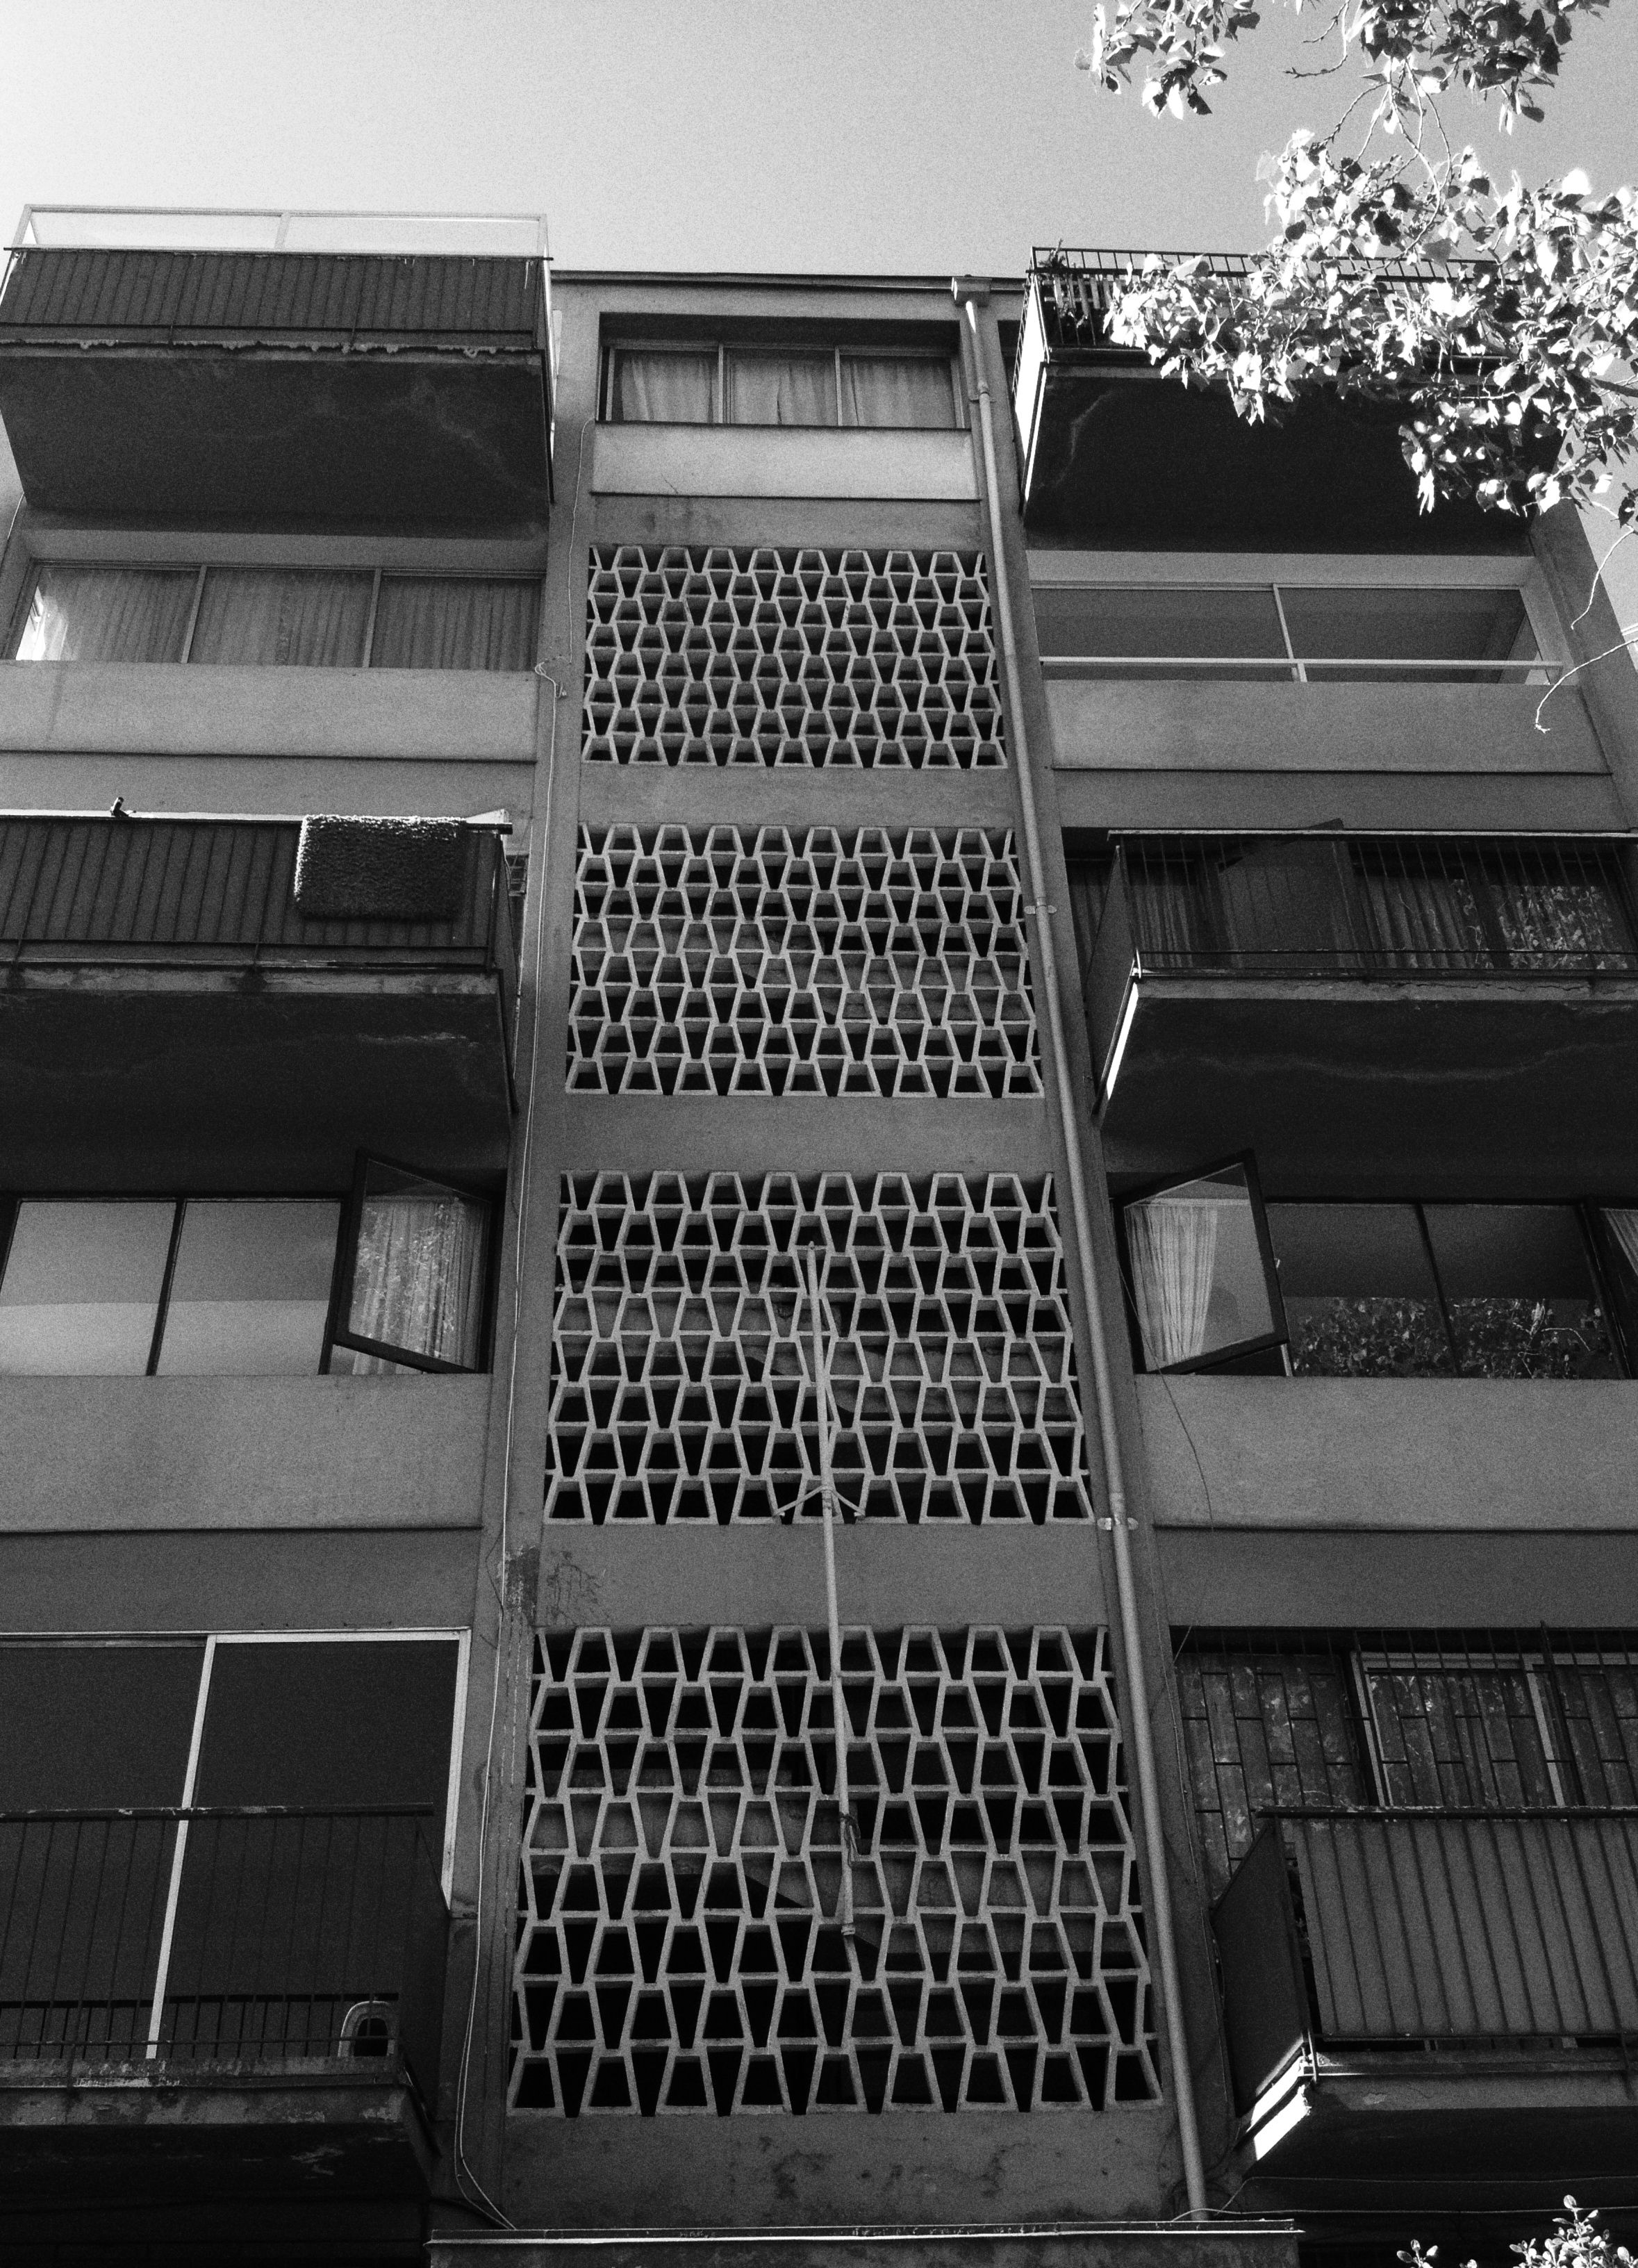 Carlos Antunez Santiago Chile Architecture Concrete Block Walls Cladding Materials